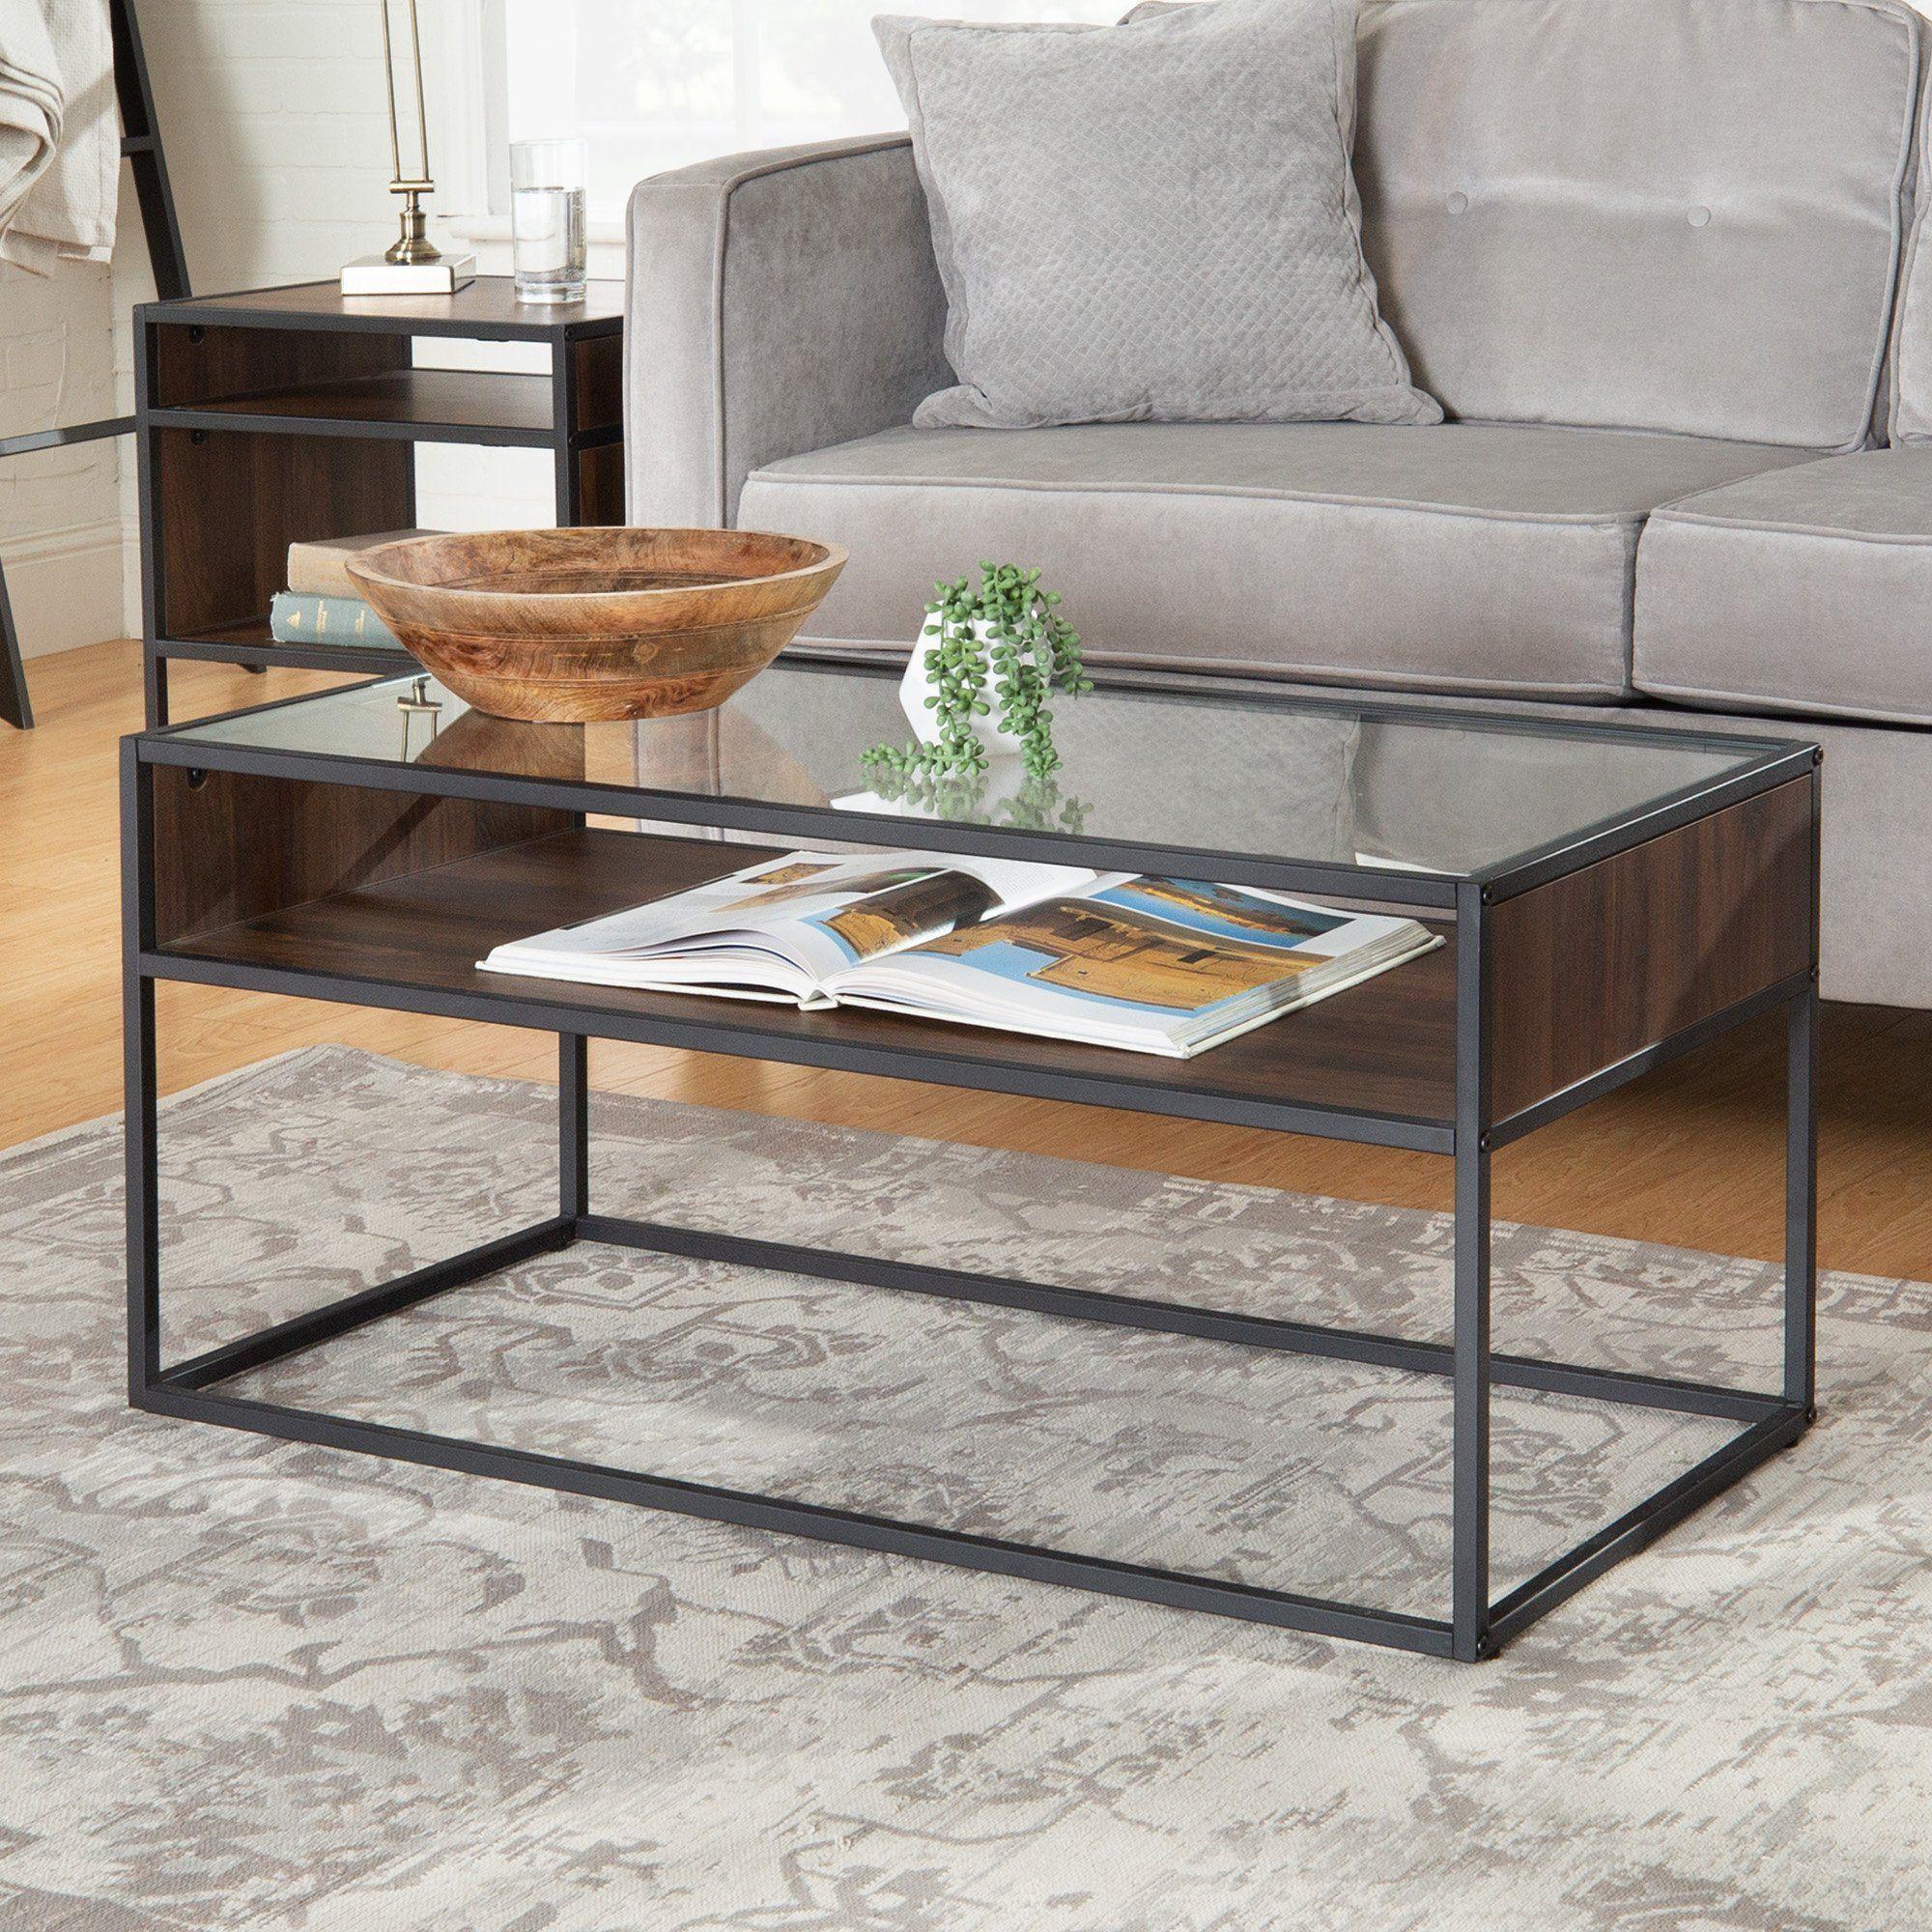 Dark Walnut And Glass Coffee Table Jersey Coffee Table Glass Coffee Table Iron Coffee Table [ 2000 x 2000 Pixel ]